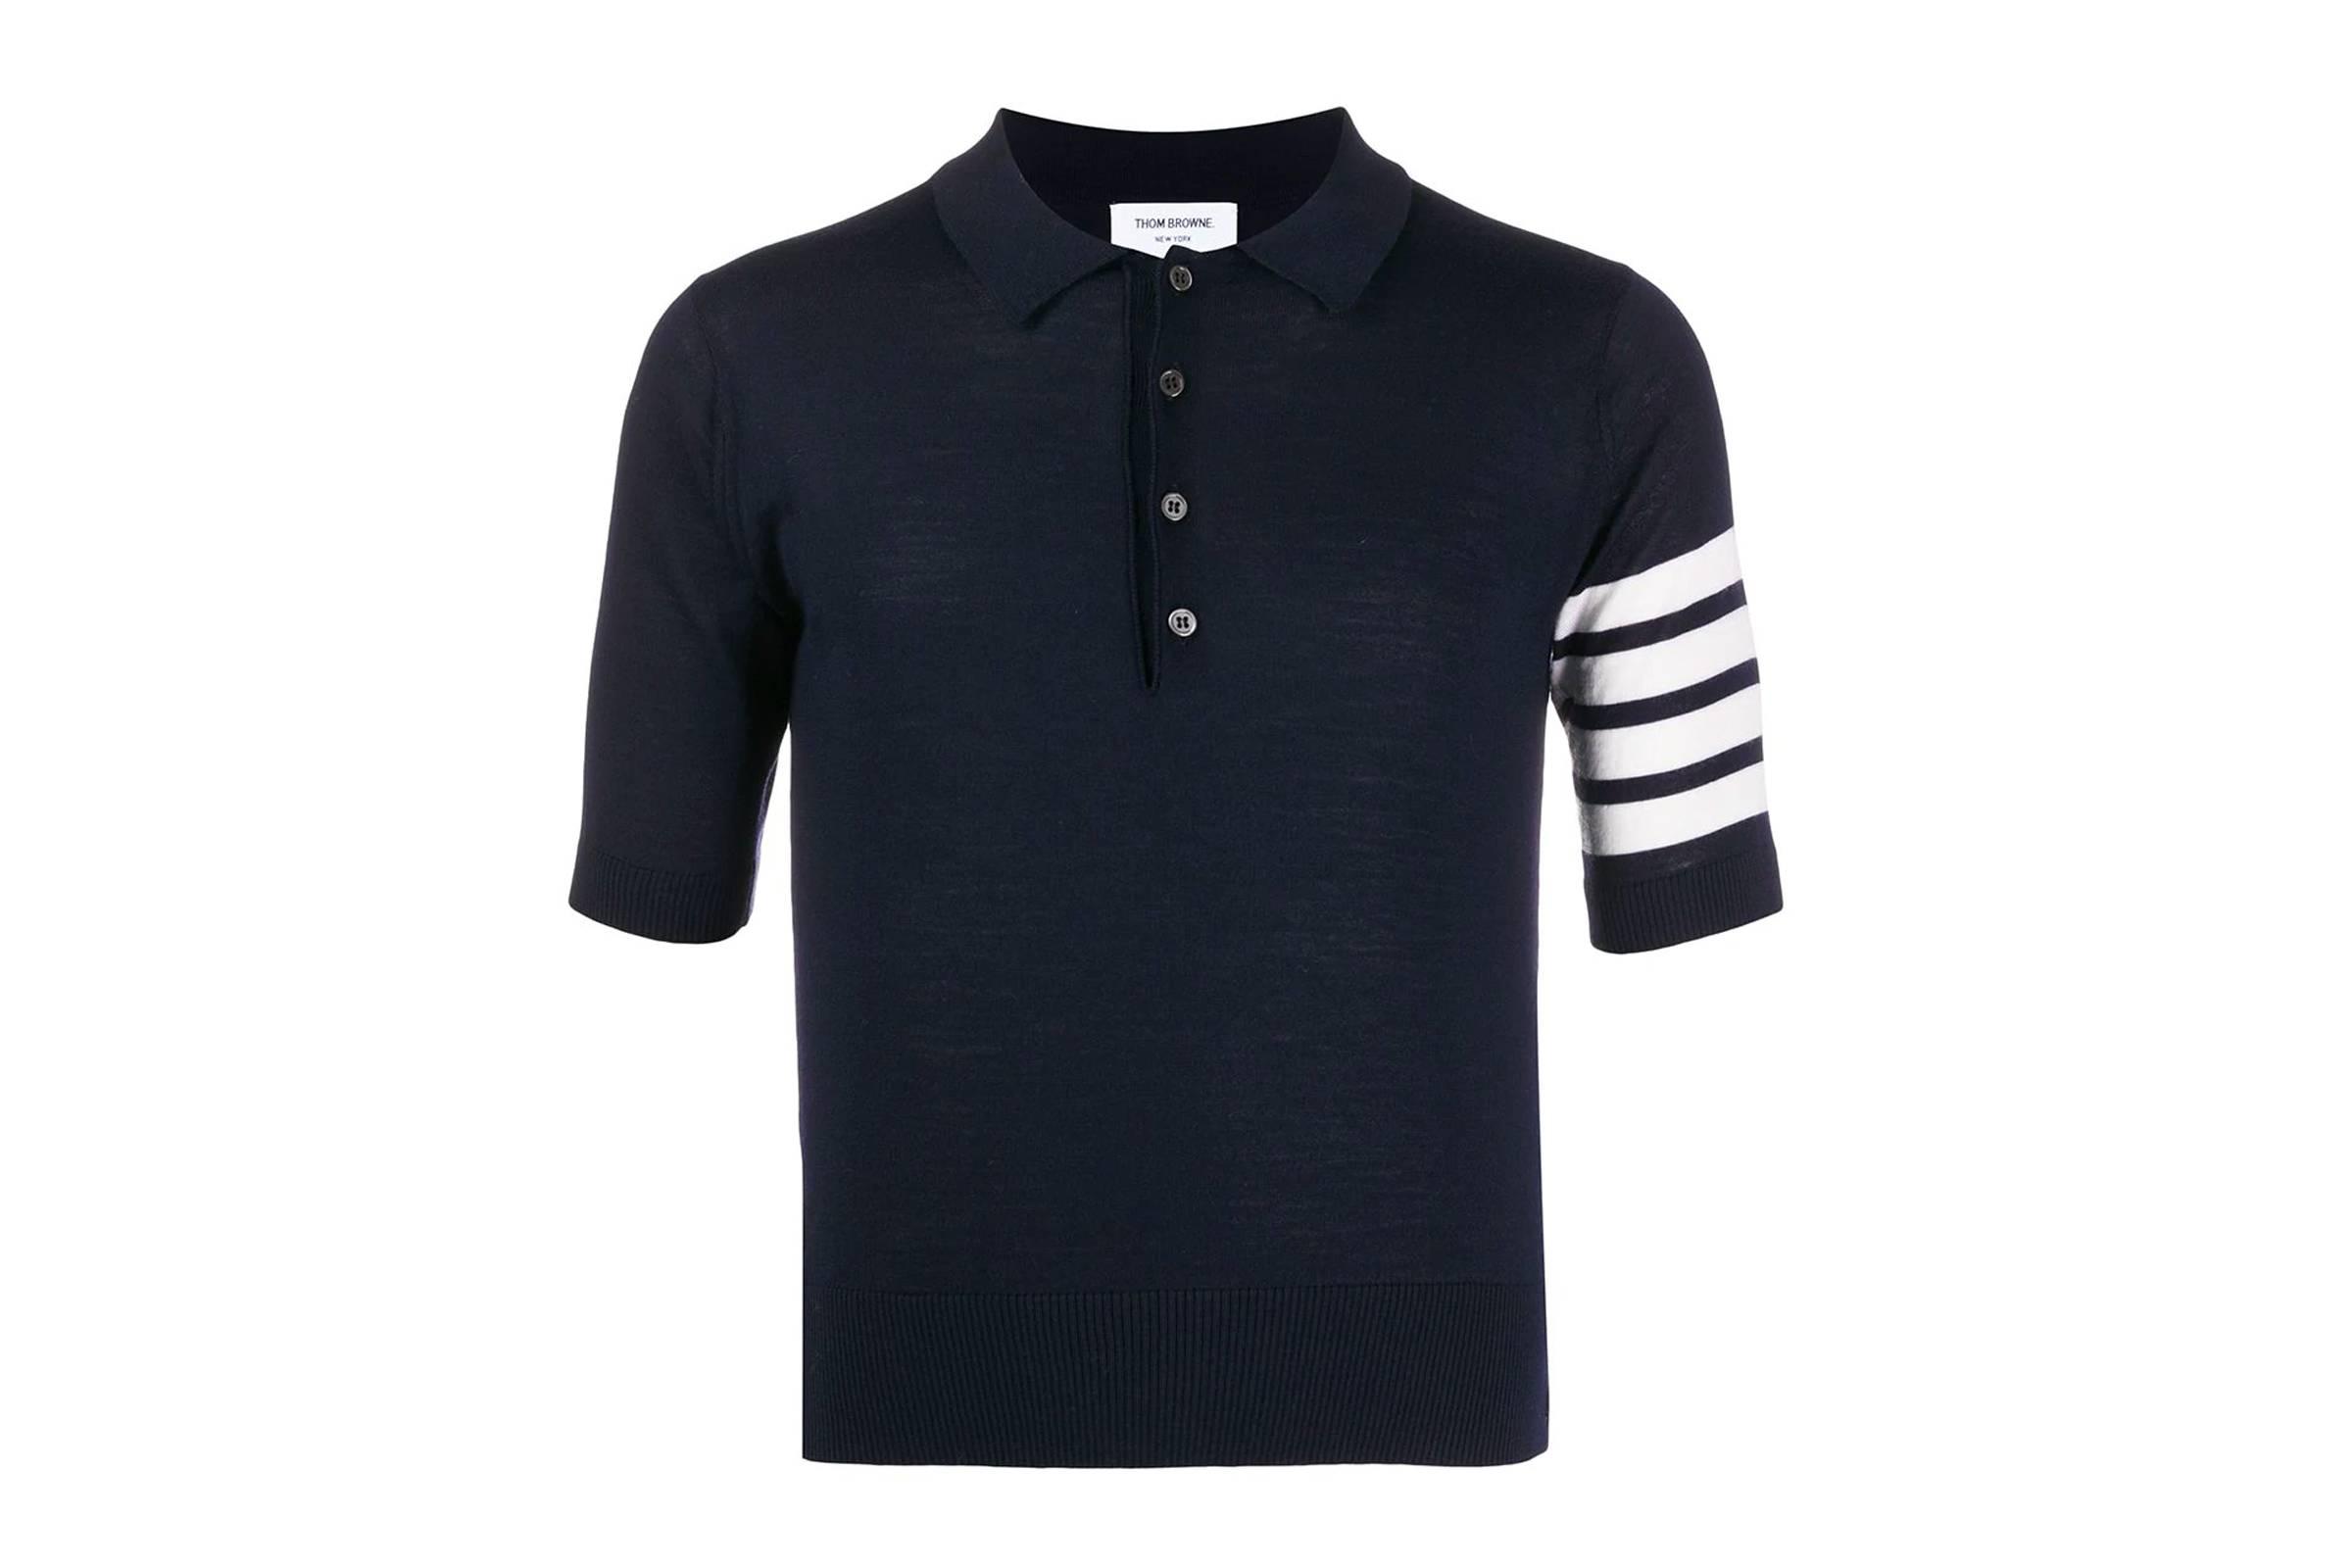 Thom Browne Short Sleeved 4-Bar Polo Shirt